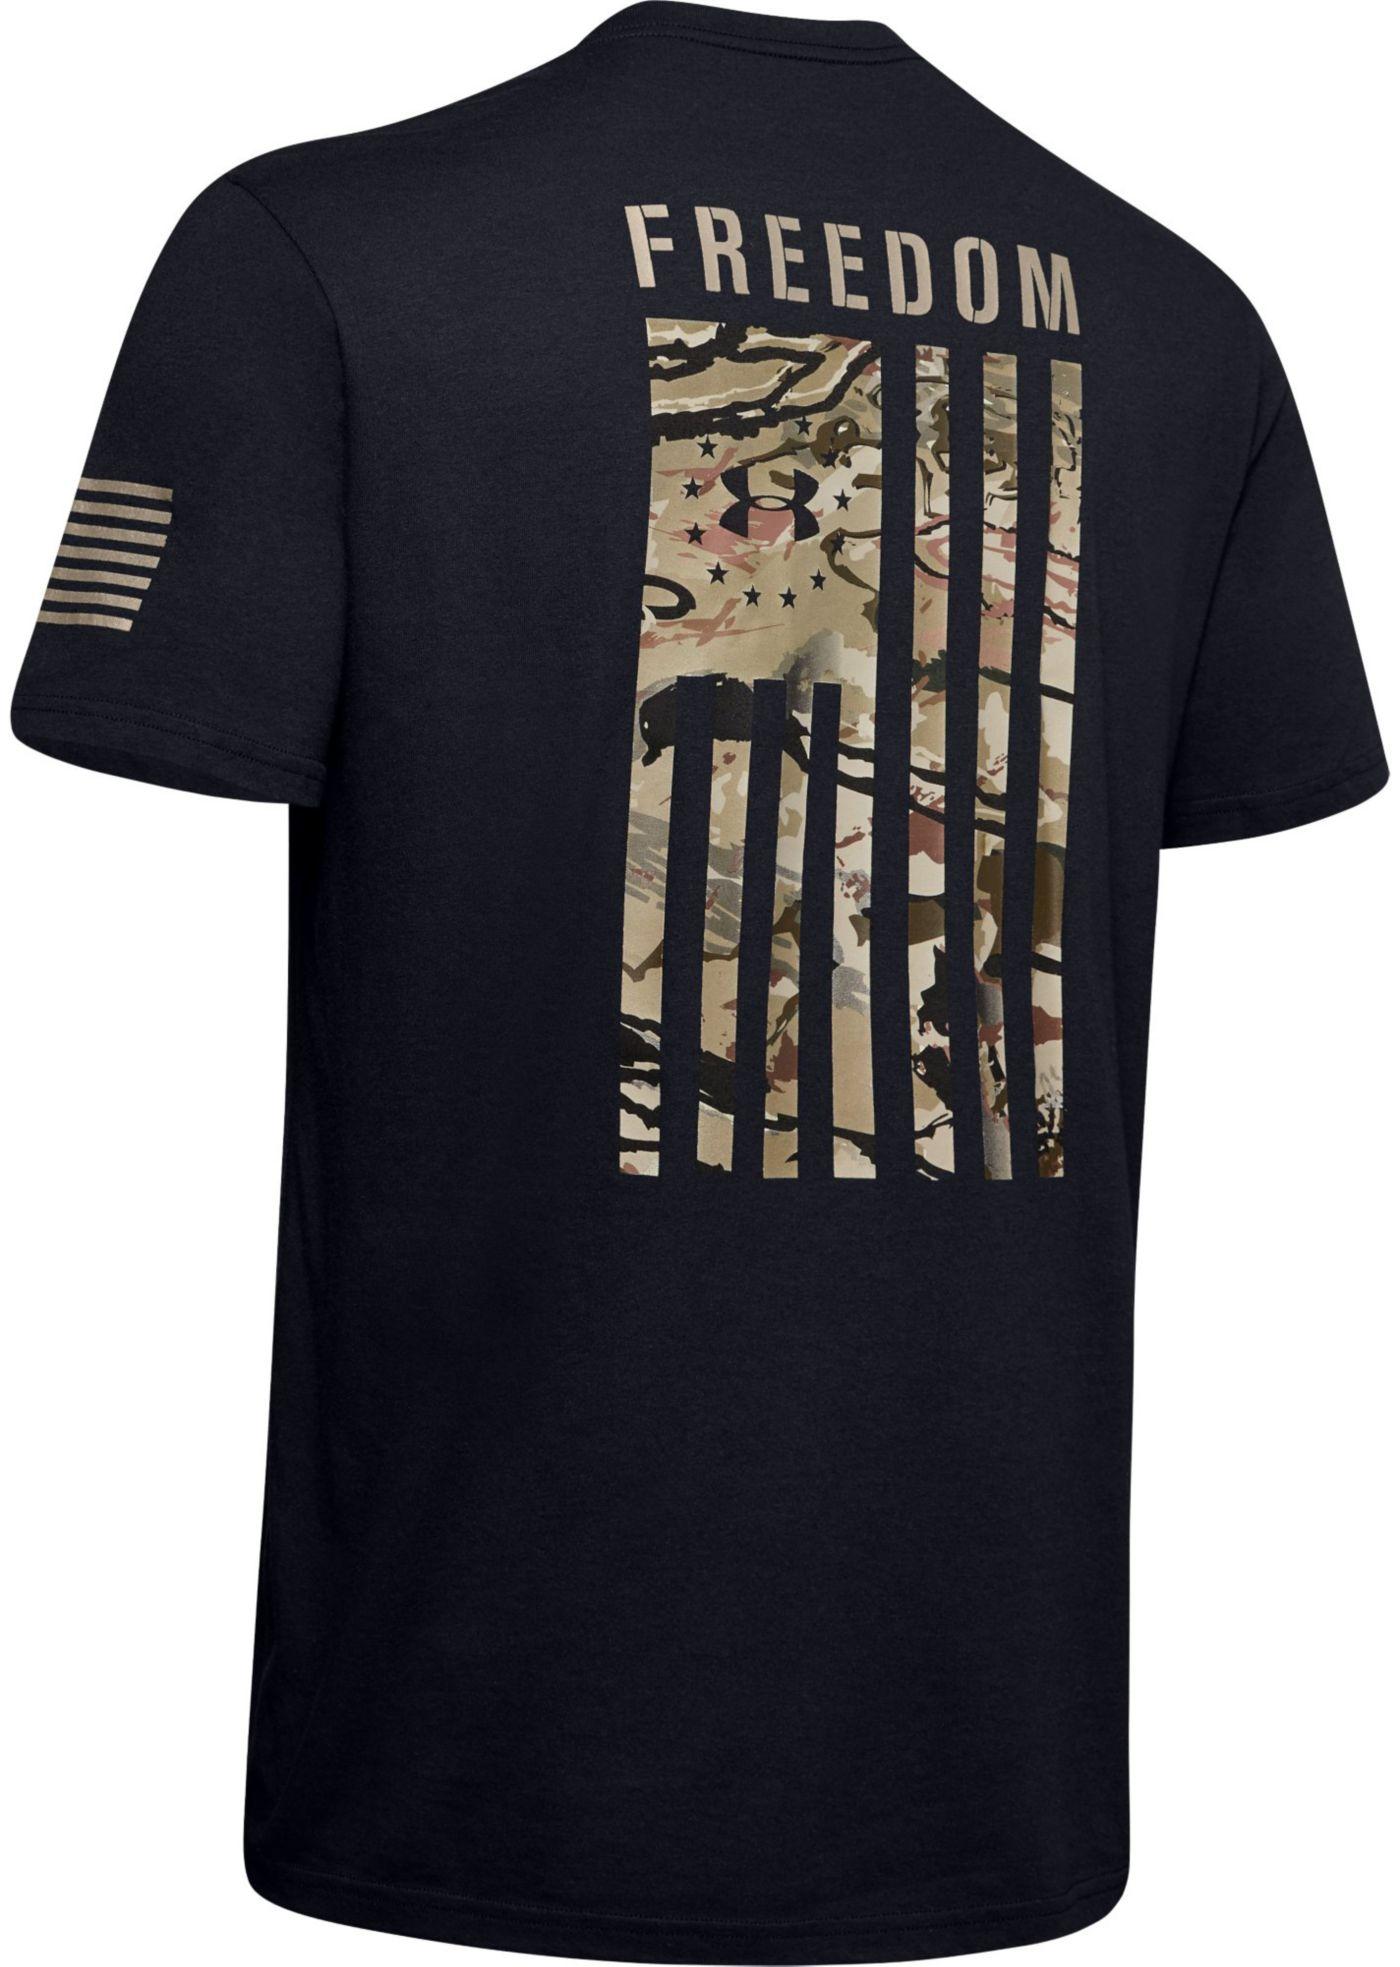 Under Armour Men's Freedom Flag Camo T-Shirt (Regular and Big & Tall)